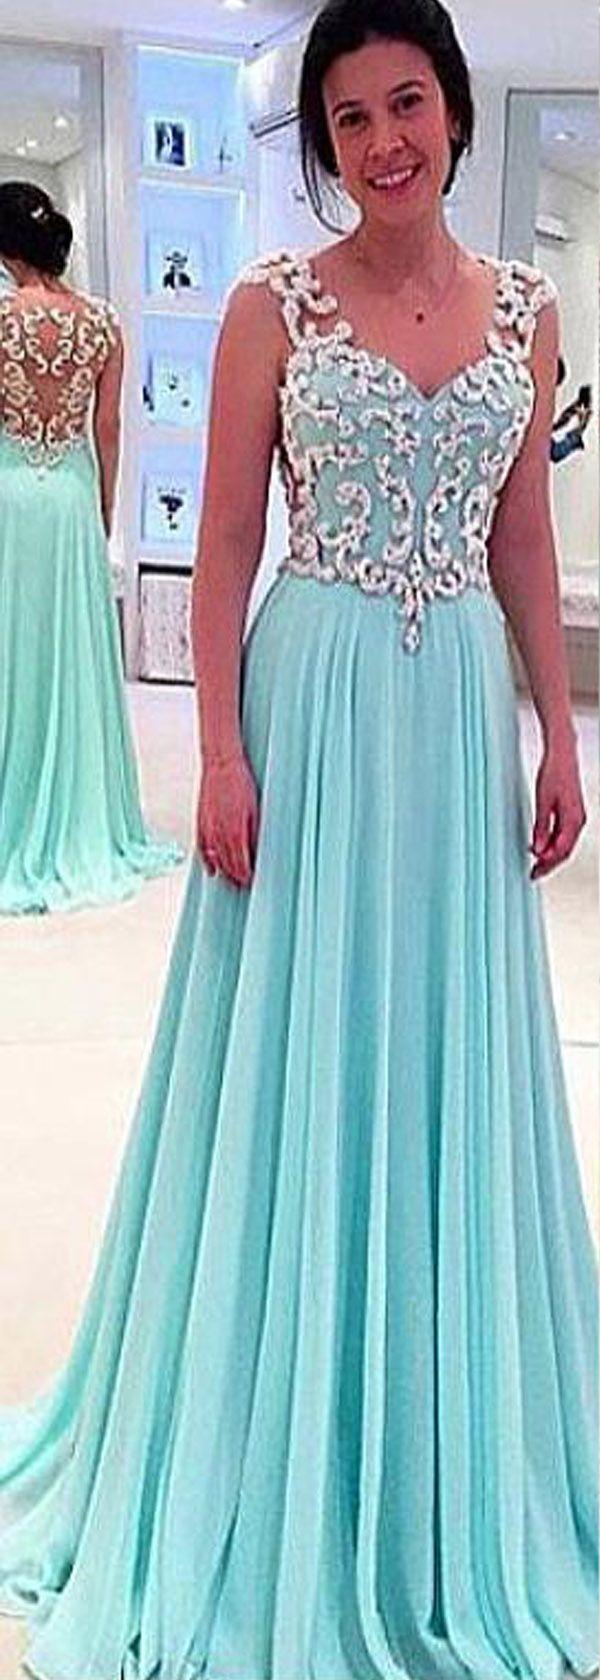 Dorable Gordmans Prom Dresses Ideas - All Wedding Dresses ...